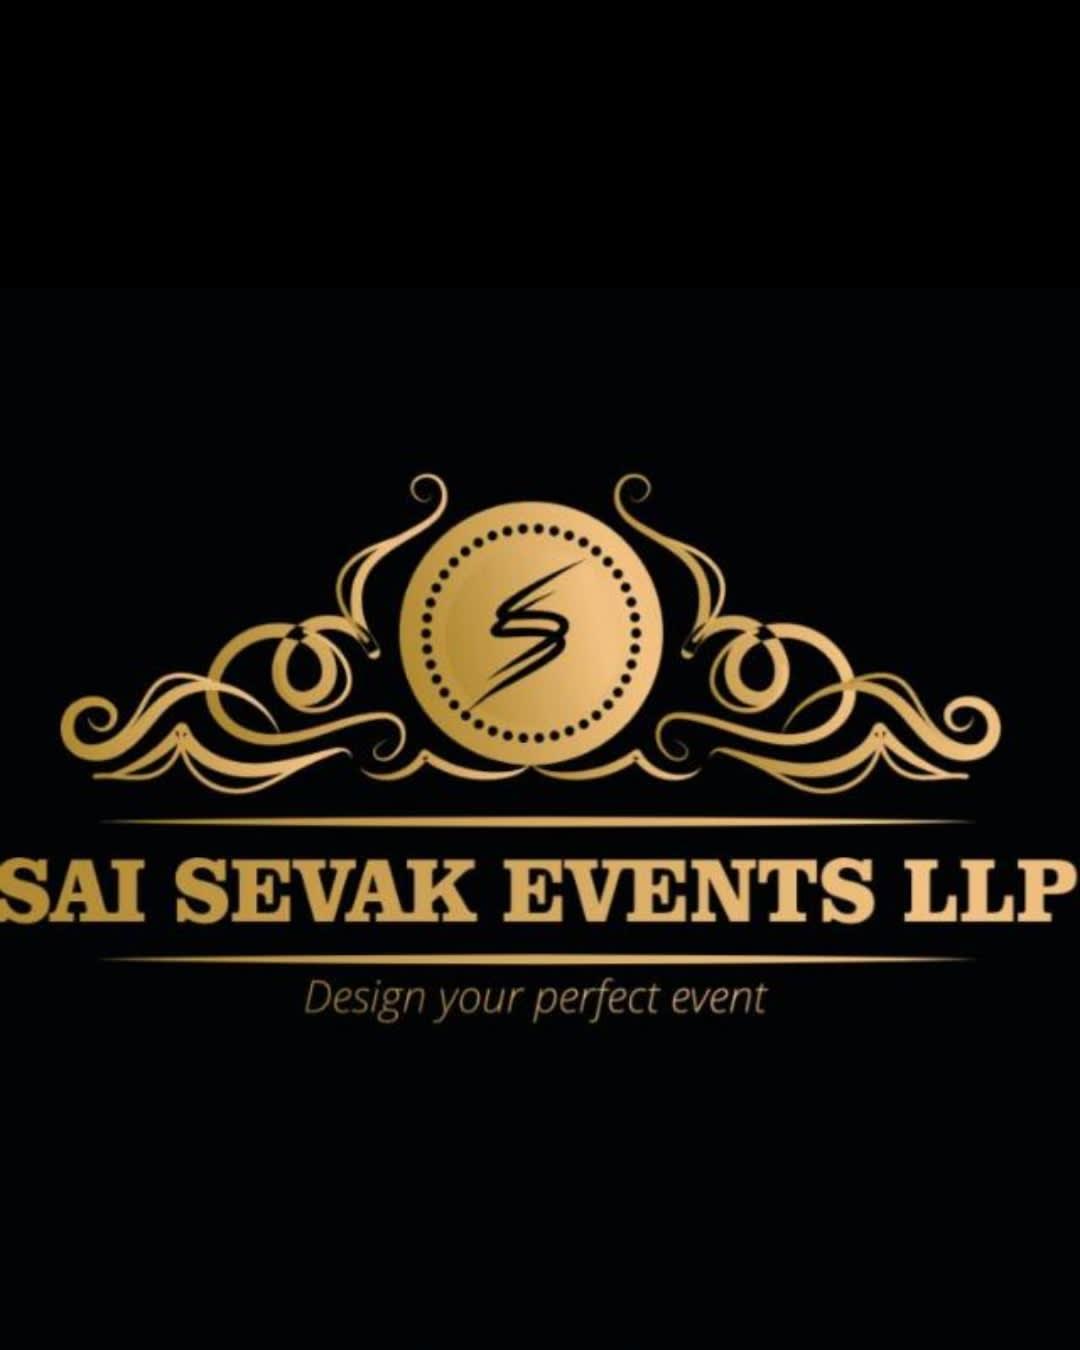 Sai Sevak Events LLP